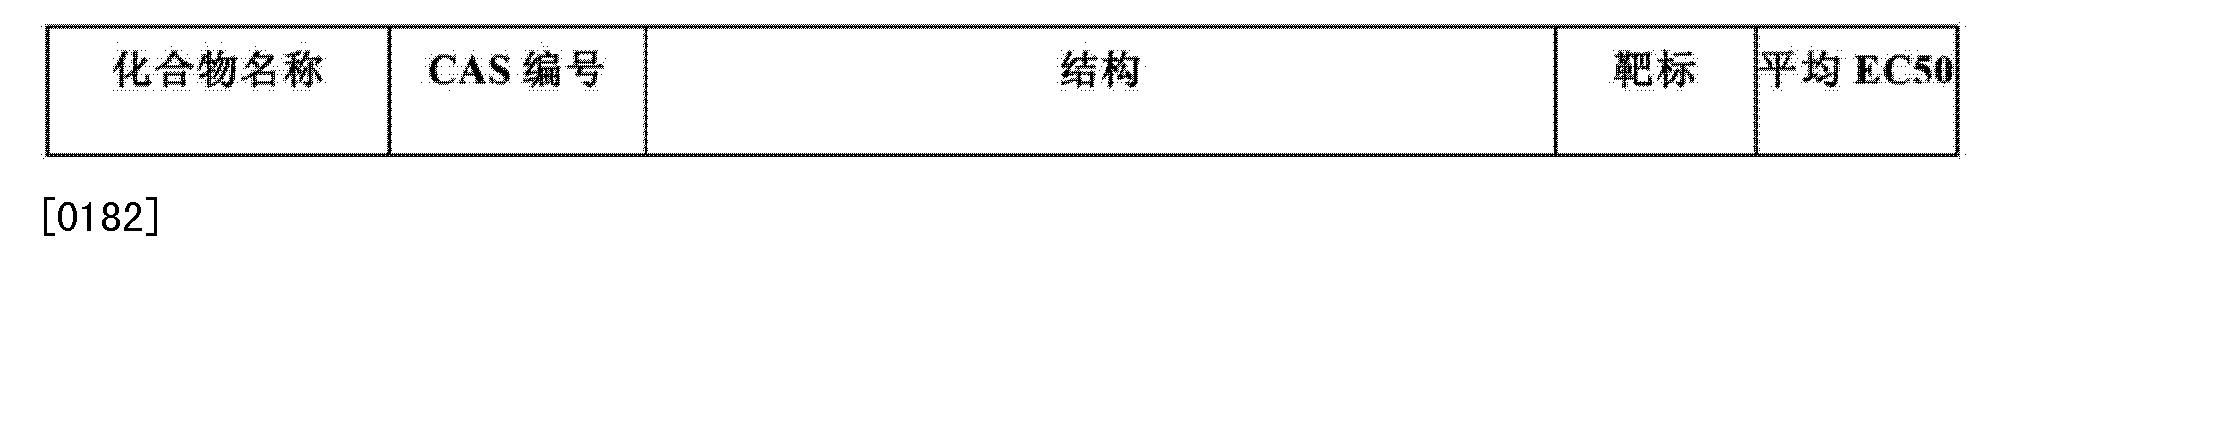 Figure CN103458970AD00393